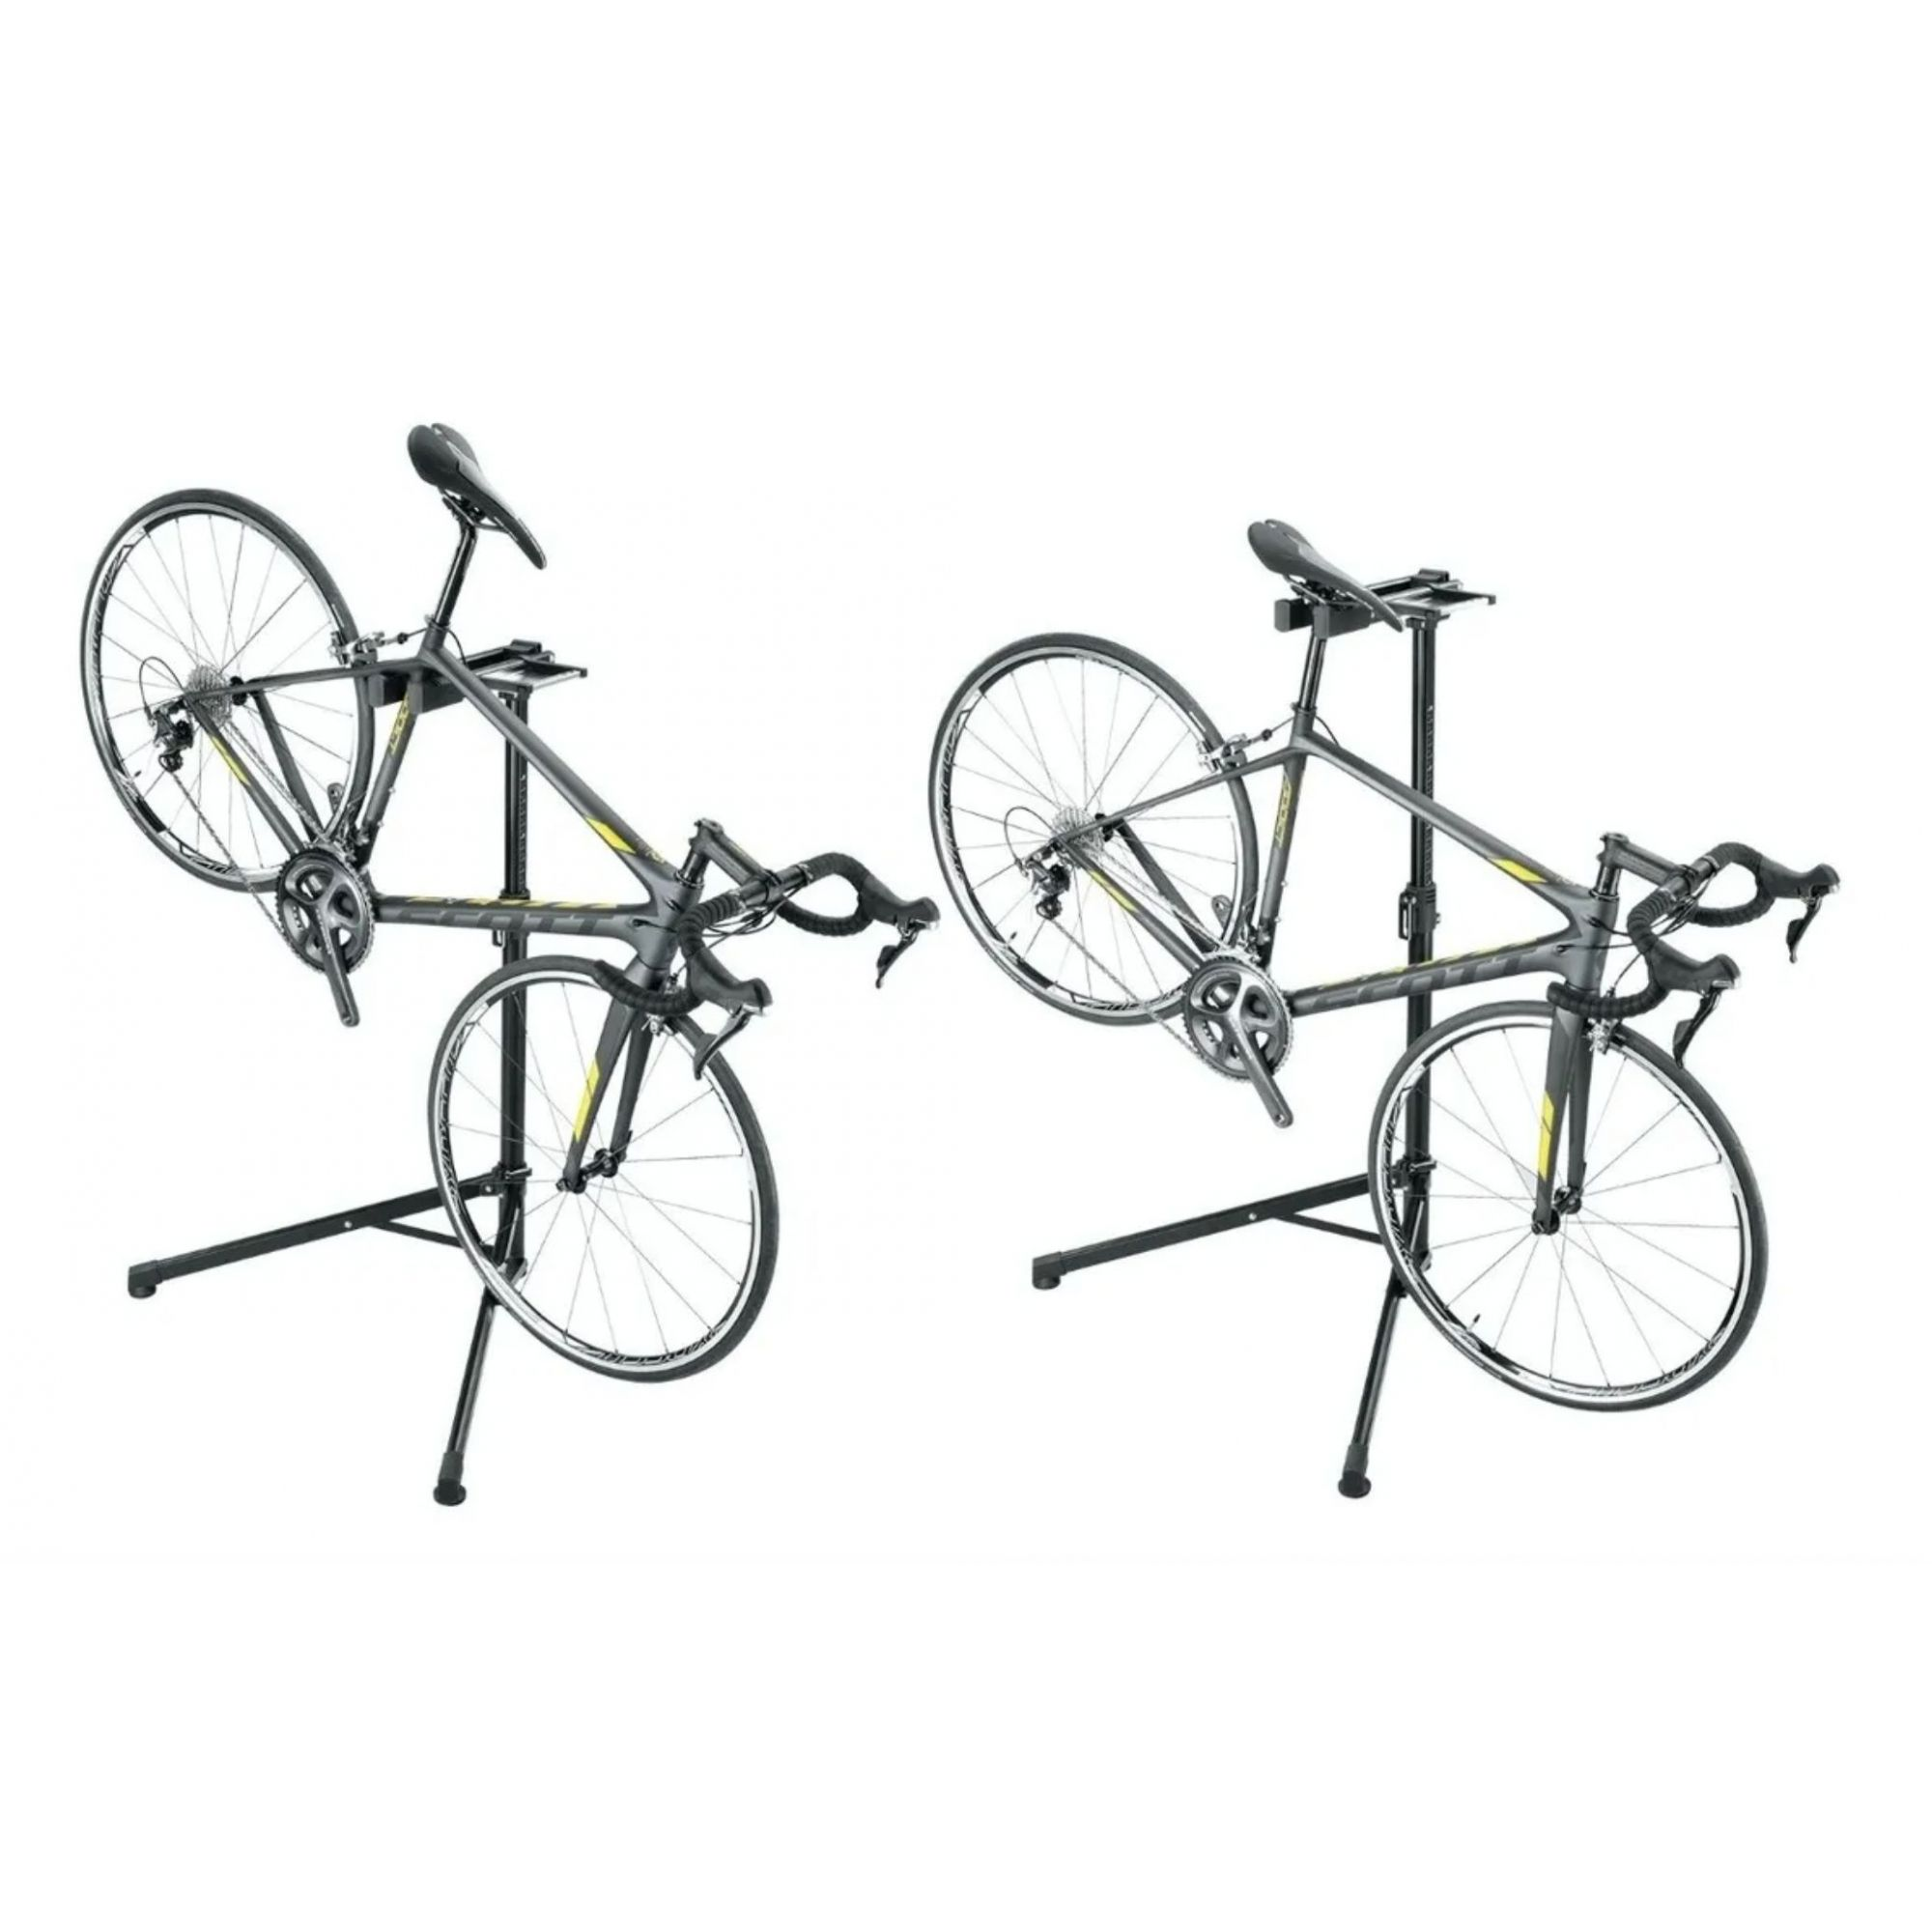 Cavalete Para Manutenção Bike Topeak Prepstand Zx Original